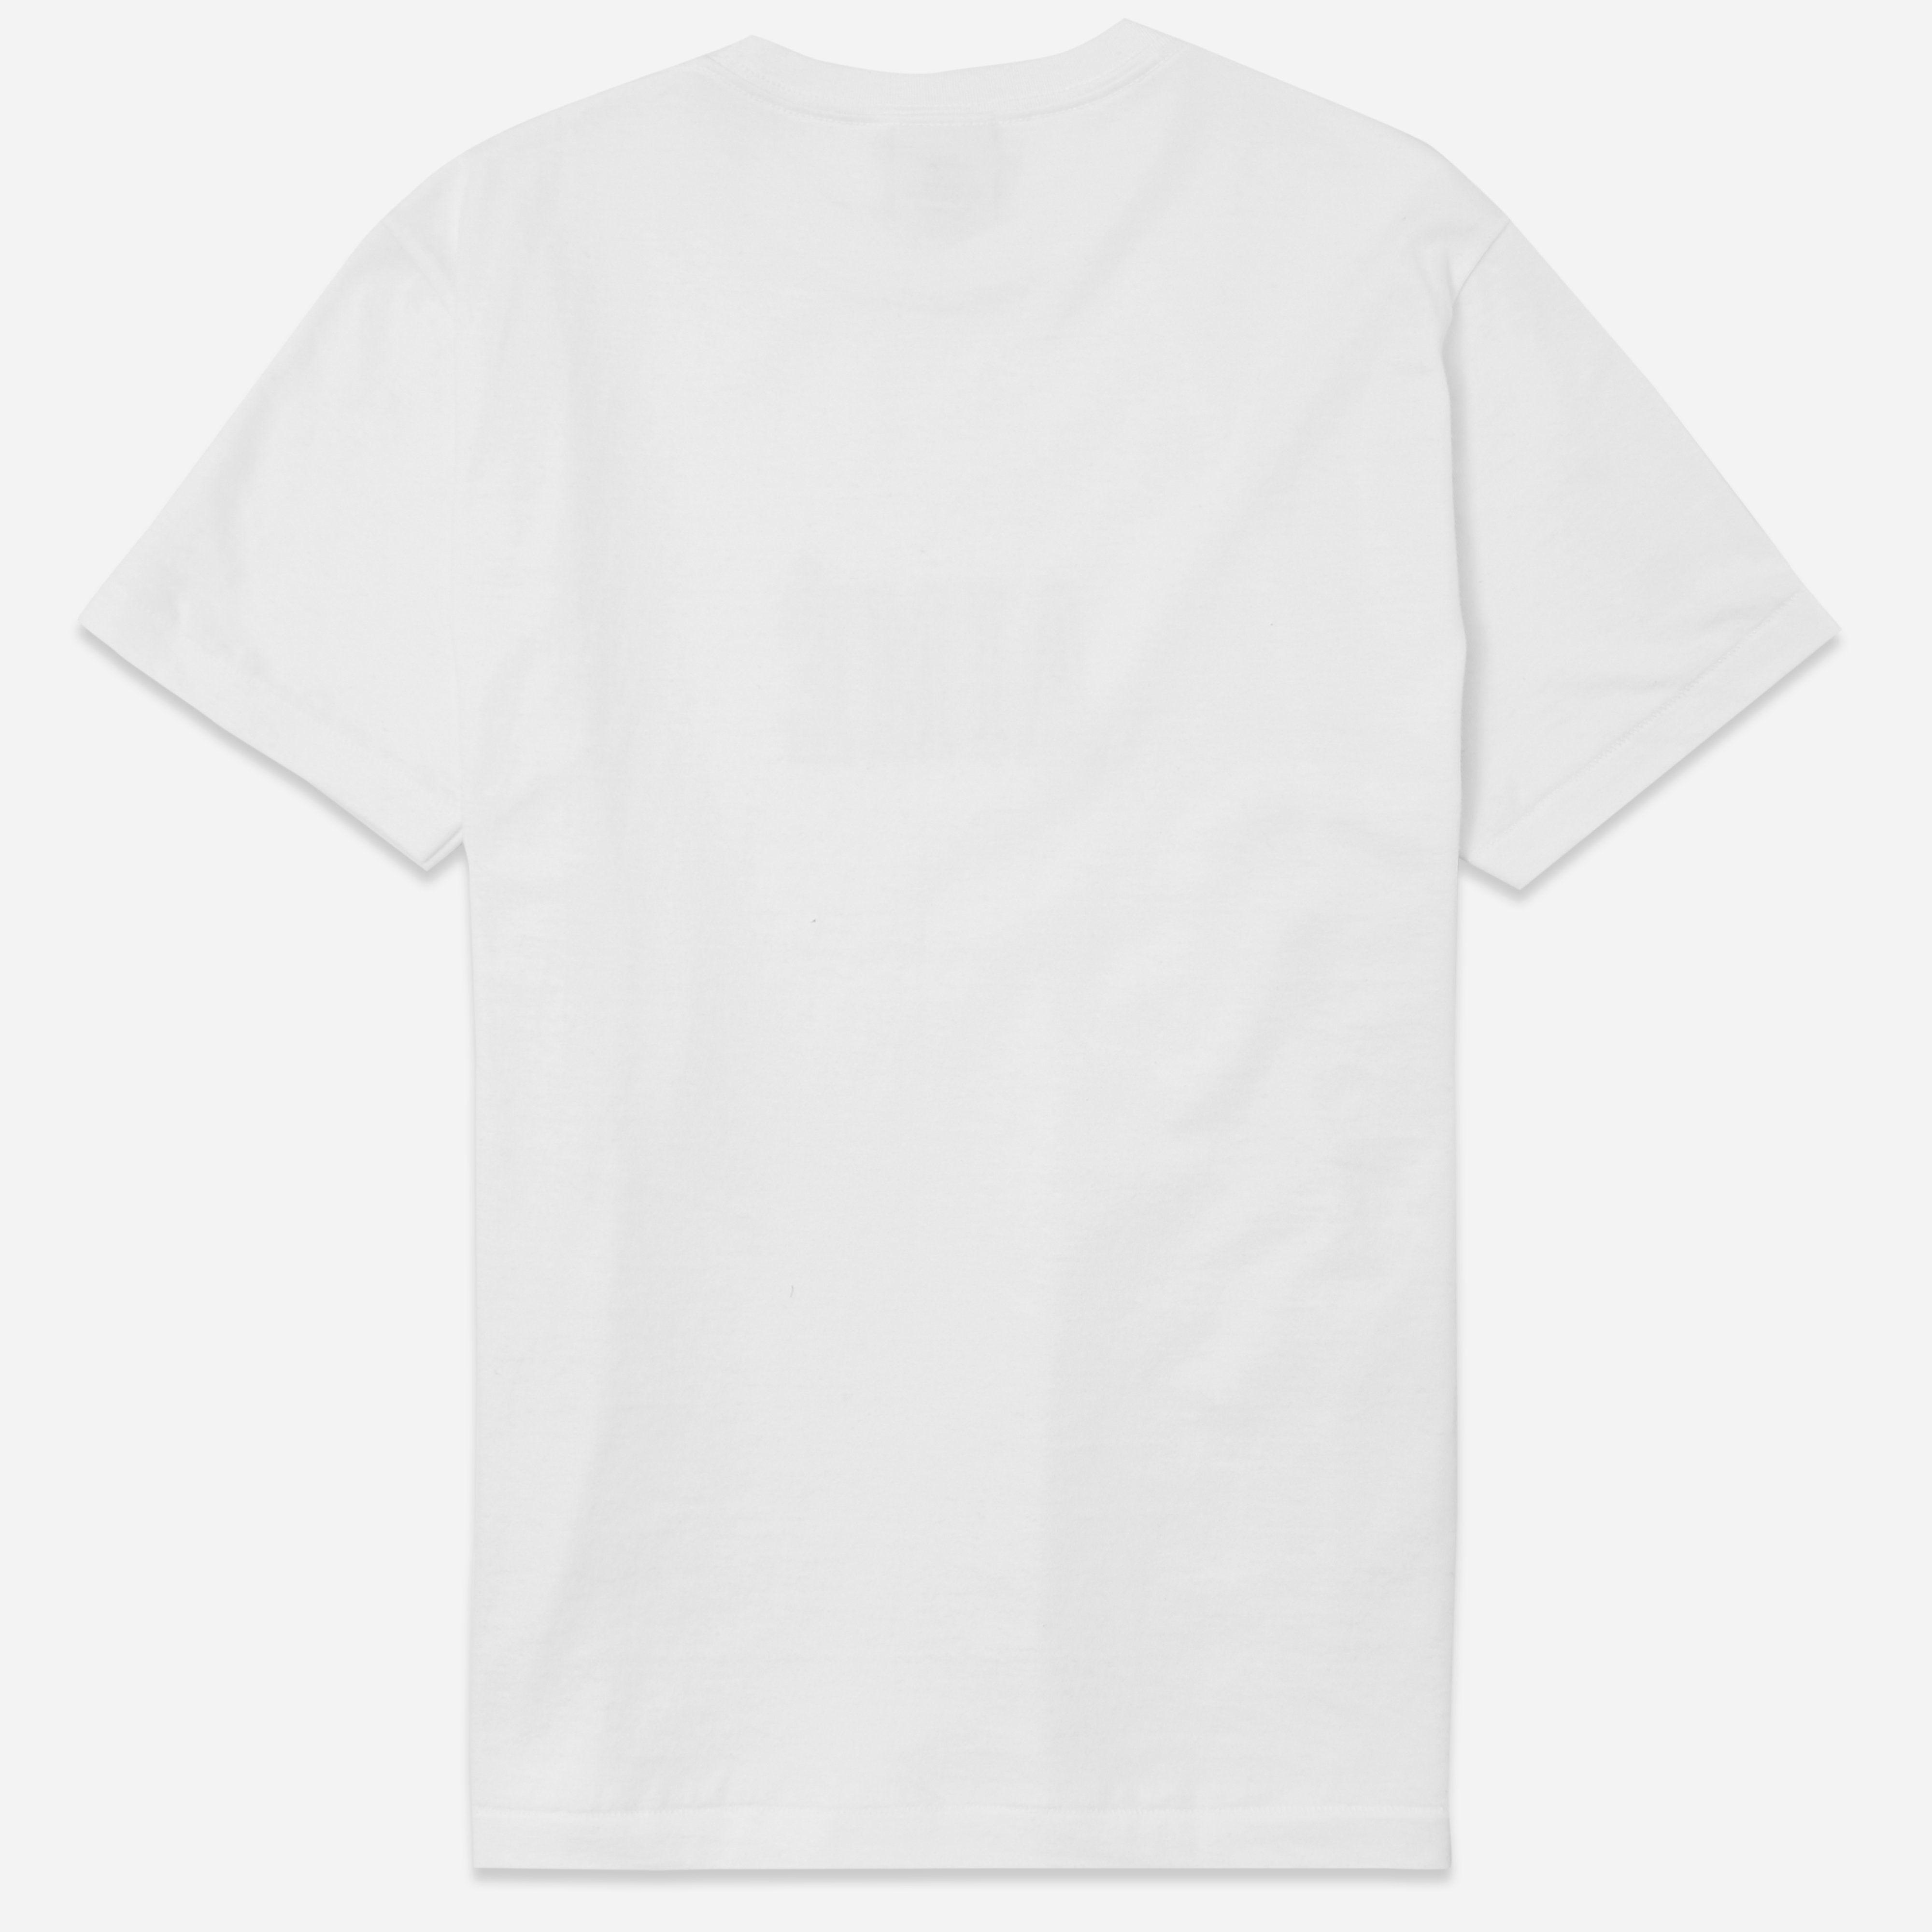 Aime Leon Dore Graphic T-shirt